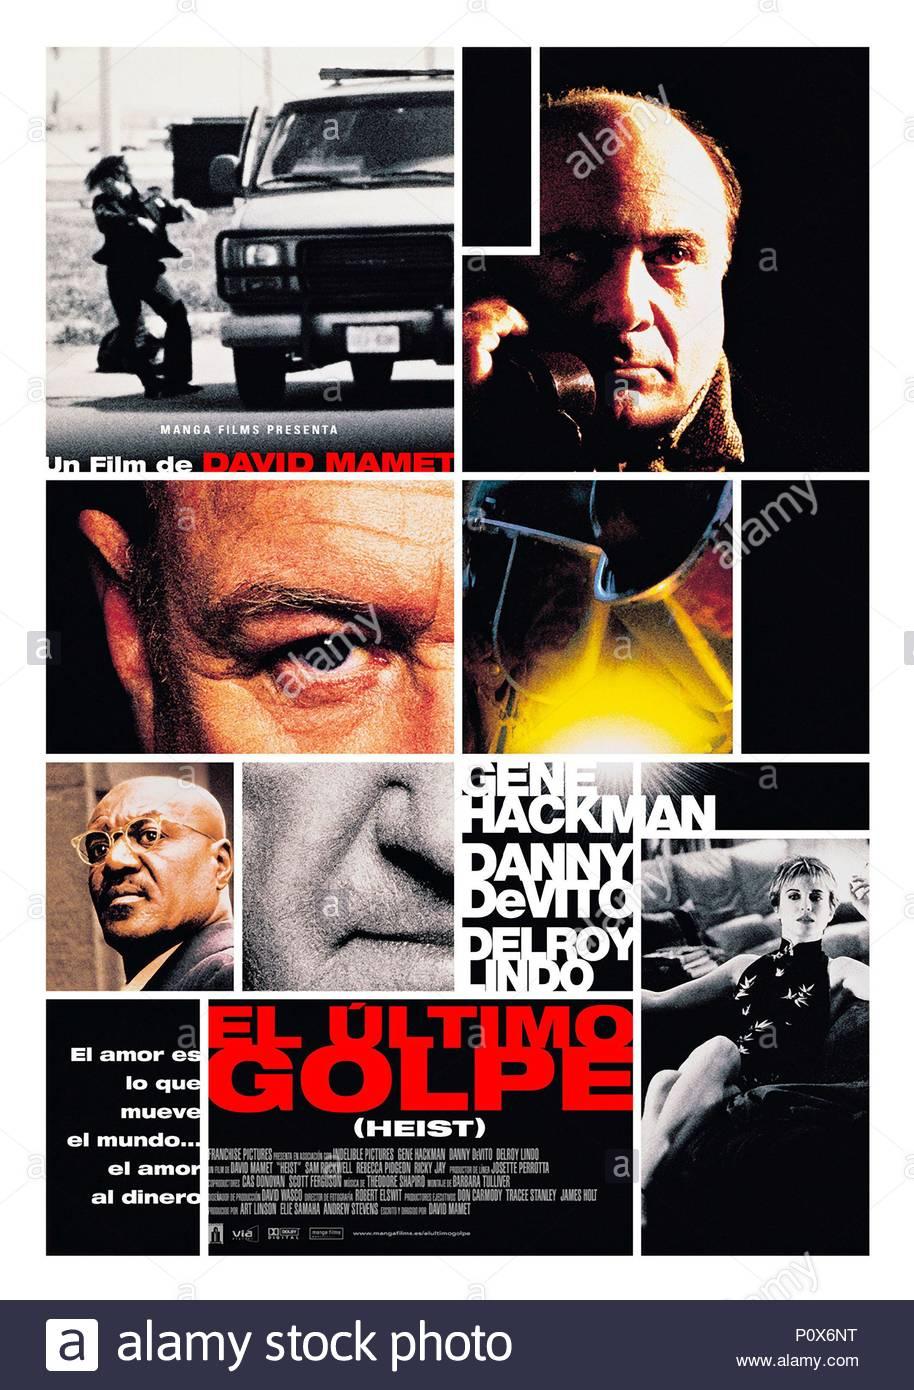 86b909939f Original Film Title  HEIST. English Title  HEIST. Film Director  DAVID  MAMET. Year  2001. Copyright  Editorial inside use only.